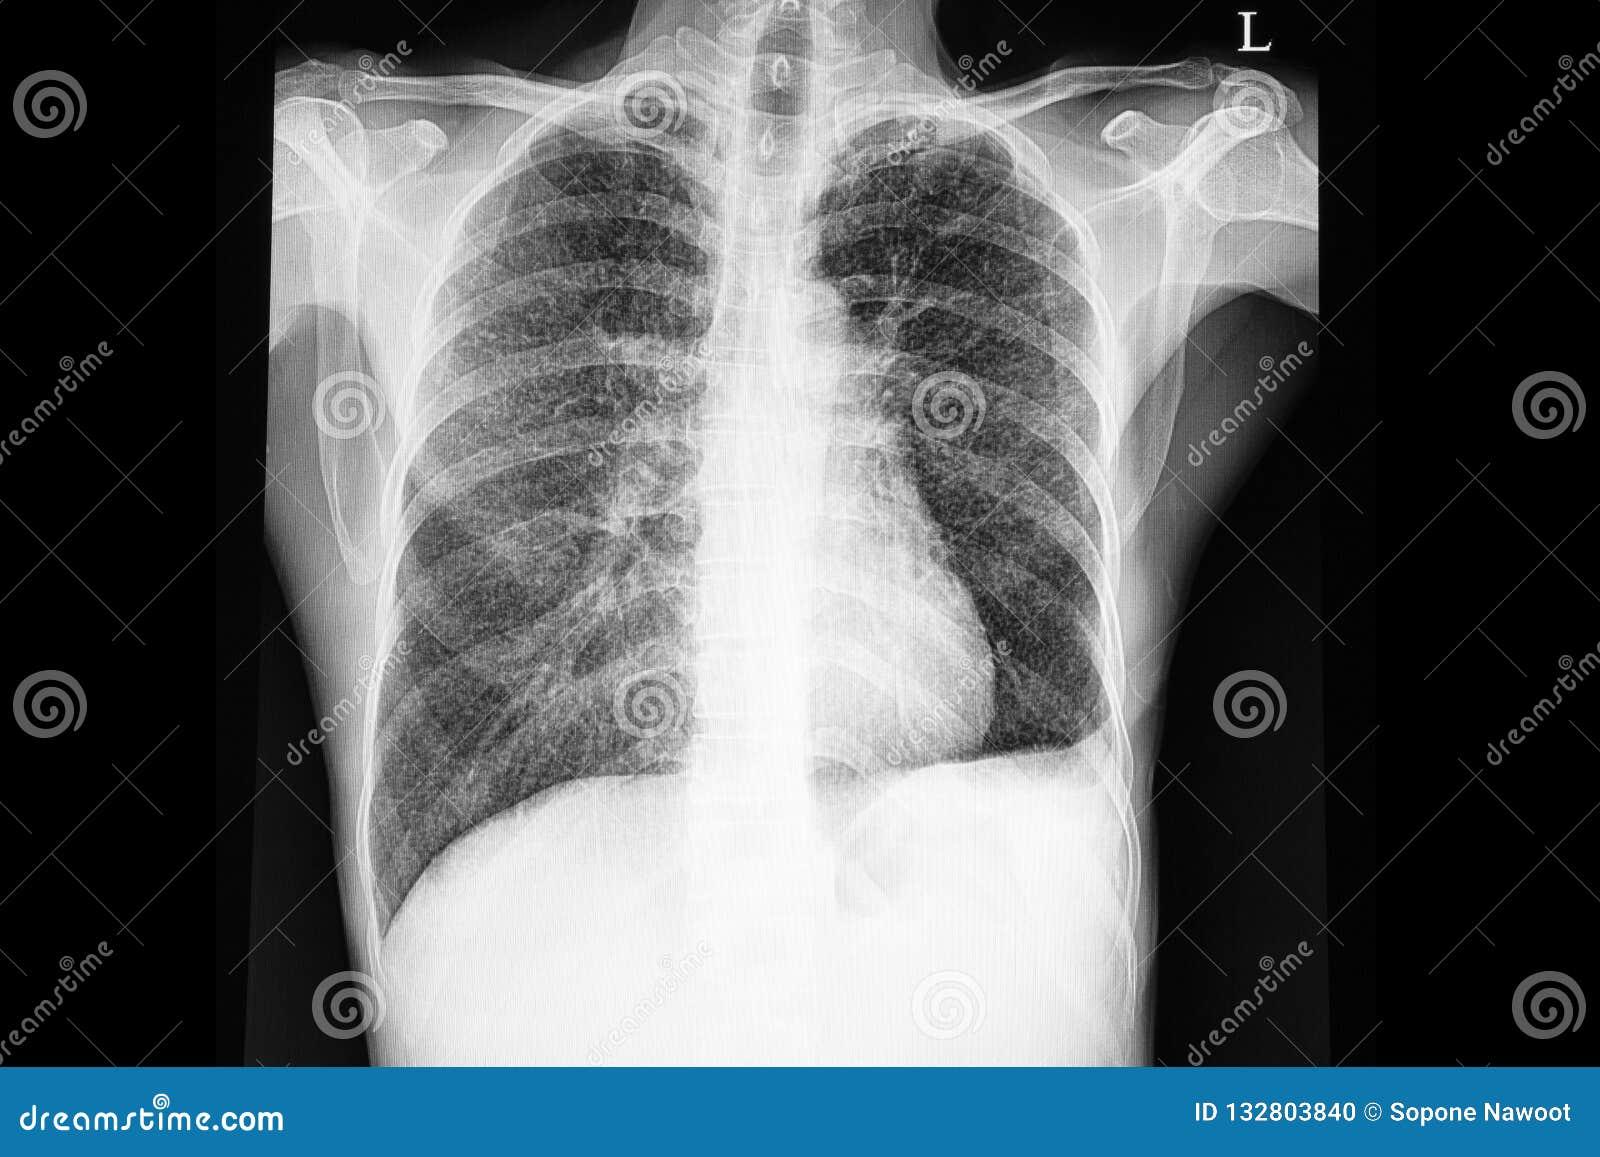 Tubercolosi Miliary